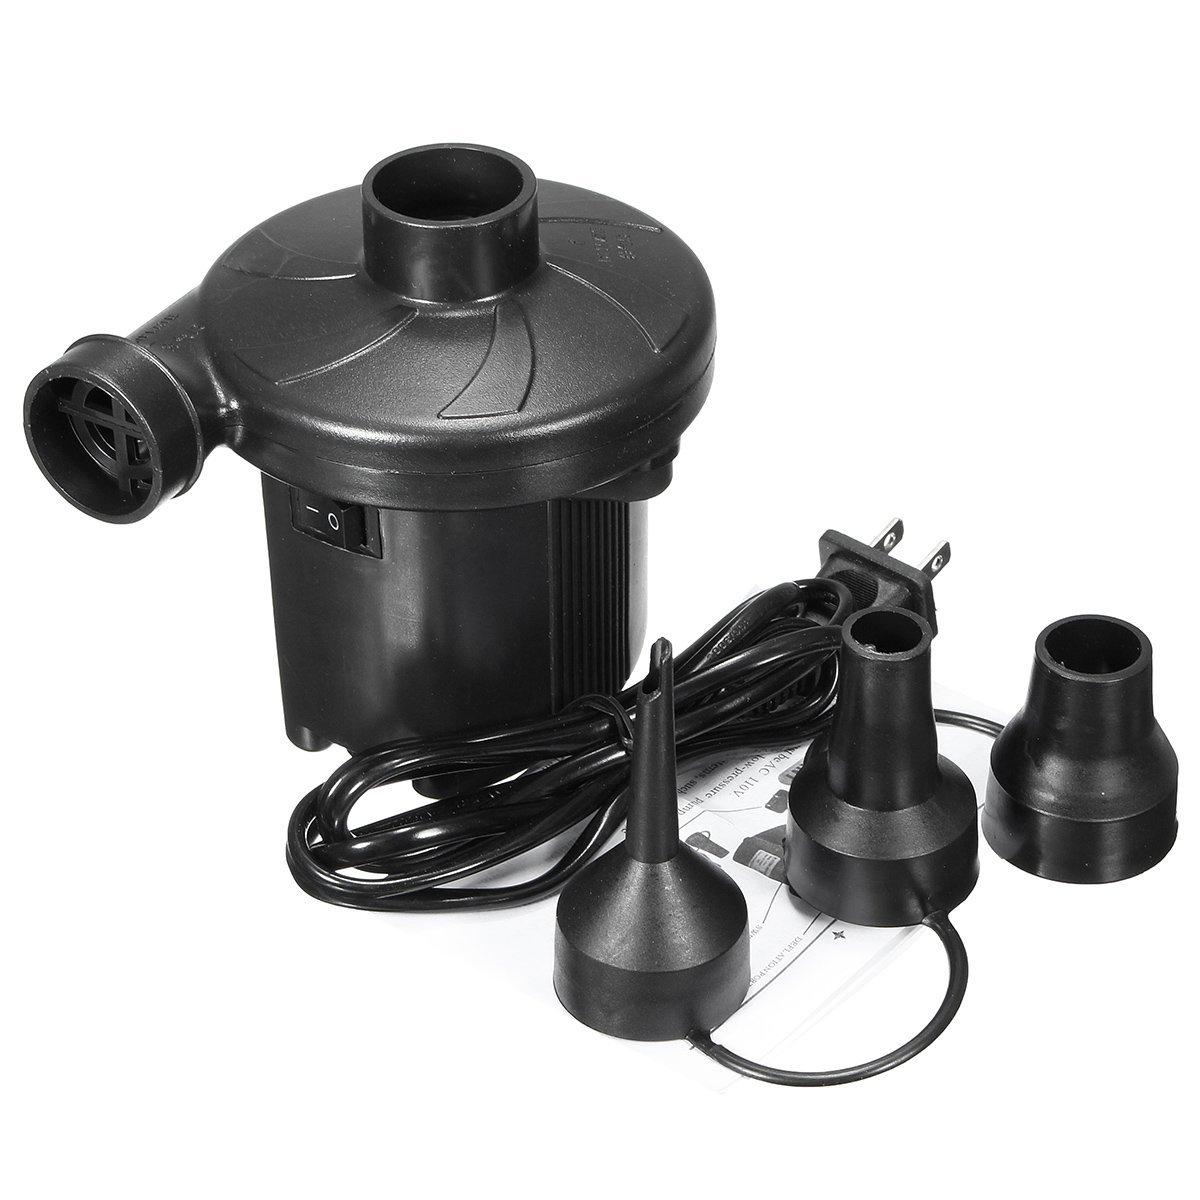 Electric Air Pump เครื่องสูบลม สูบเข้า สูบออก ที่สูบลม ที่สูบลมไฟฟ้า